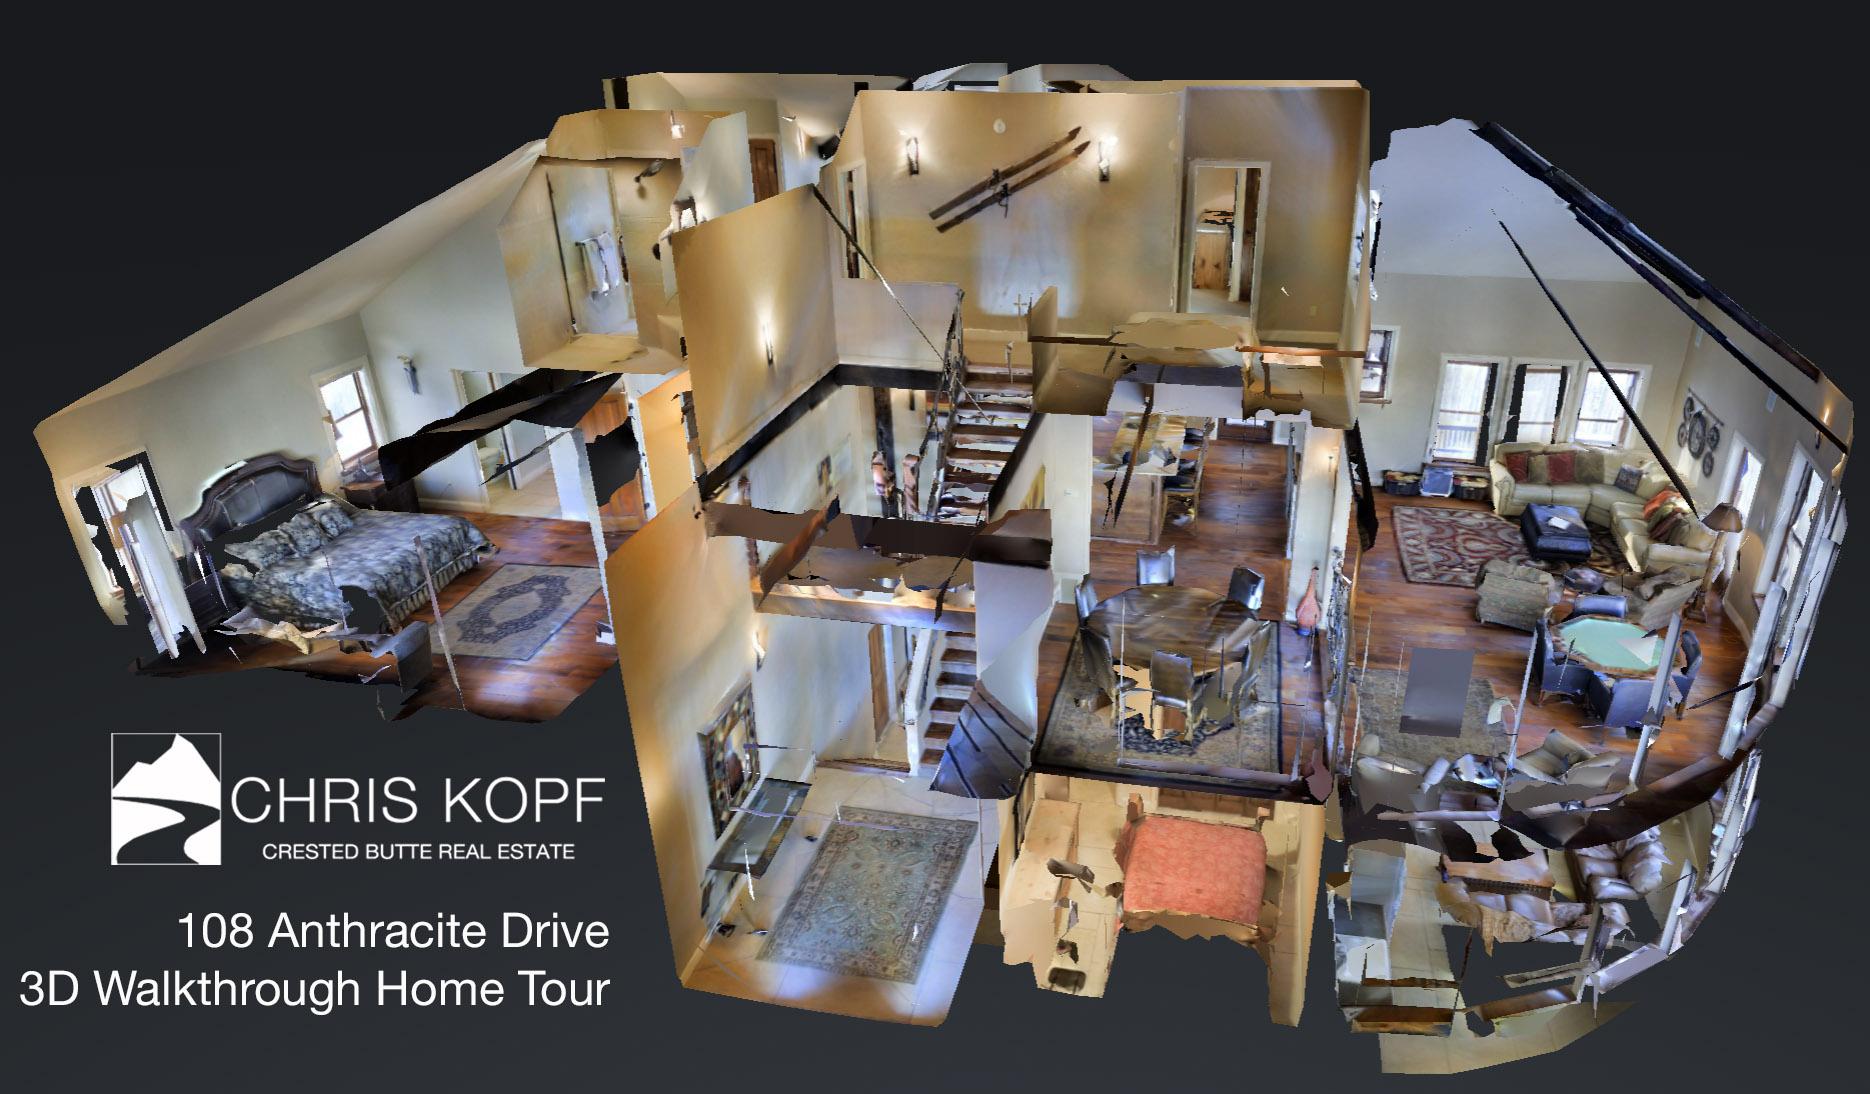 New 3d walkthrough home tour 108 anthracite drive mt for 3d house walkthrough